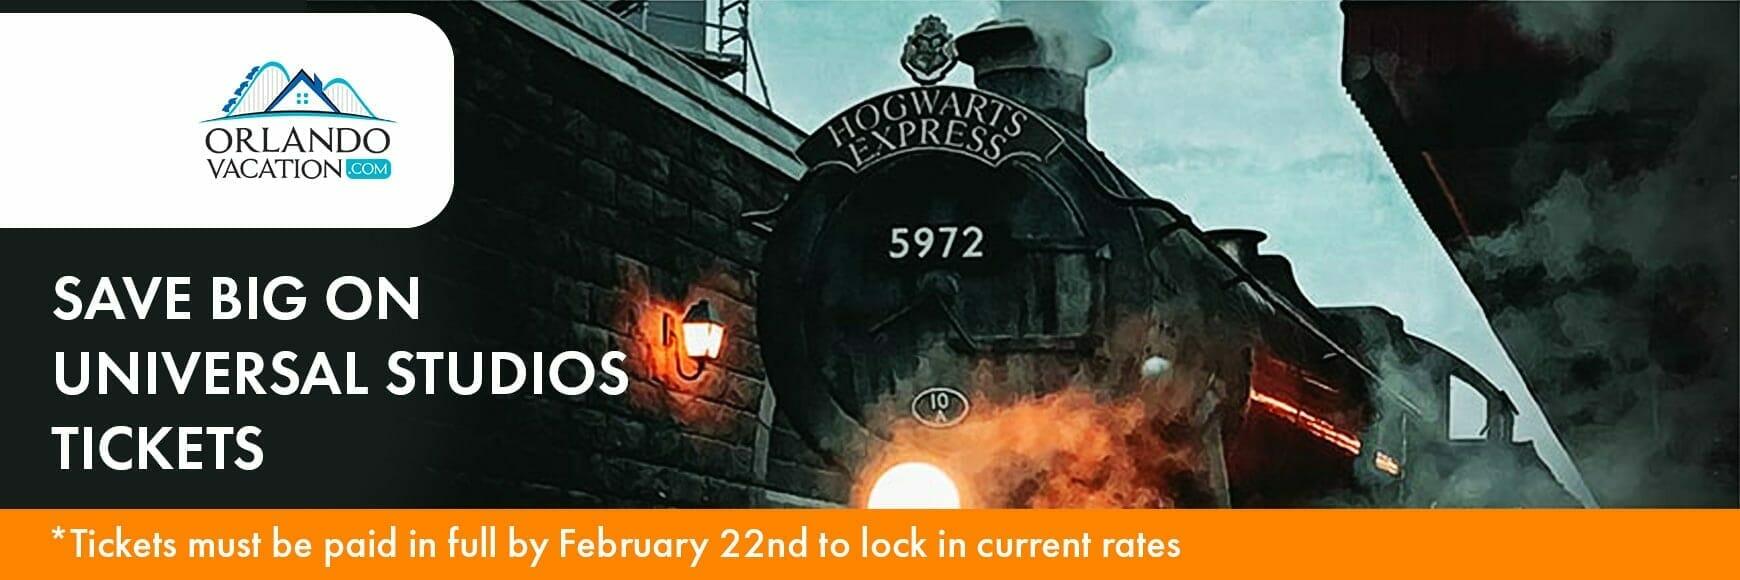 Universal Studios ticket promo